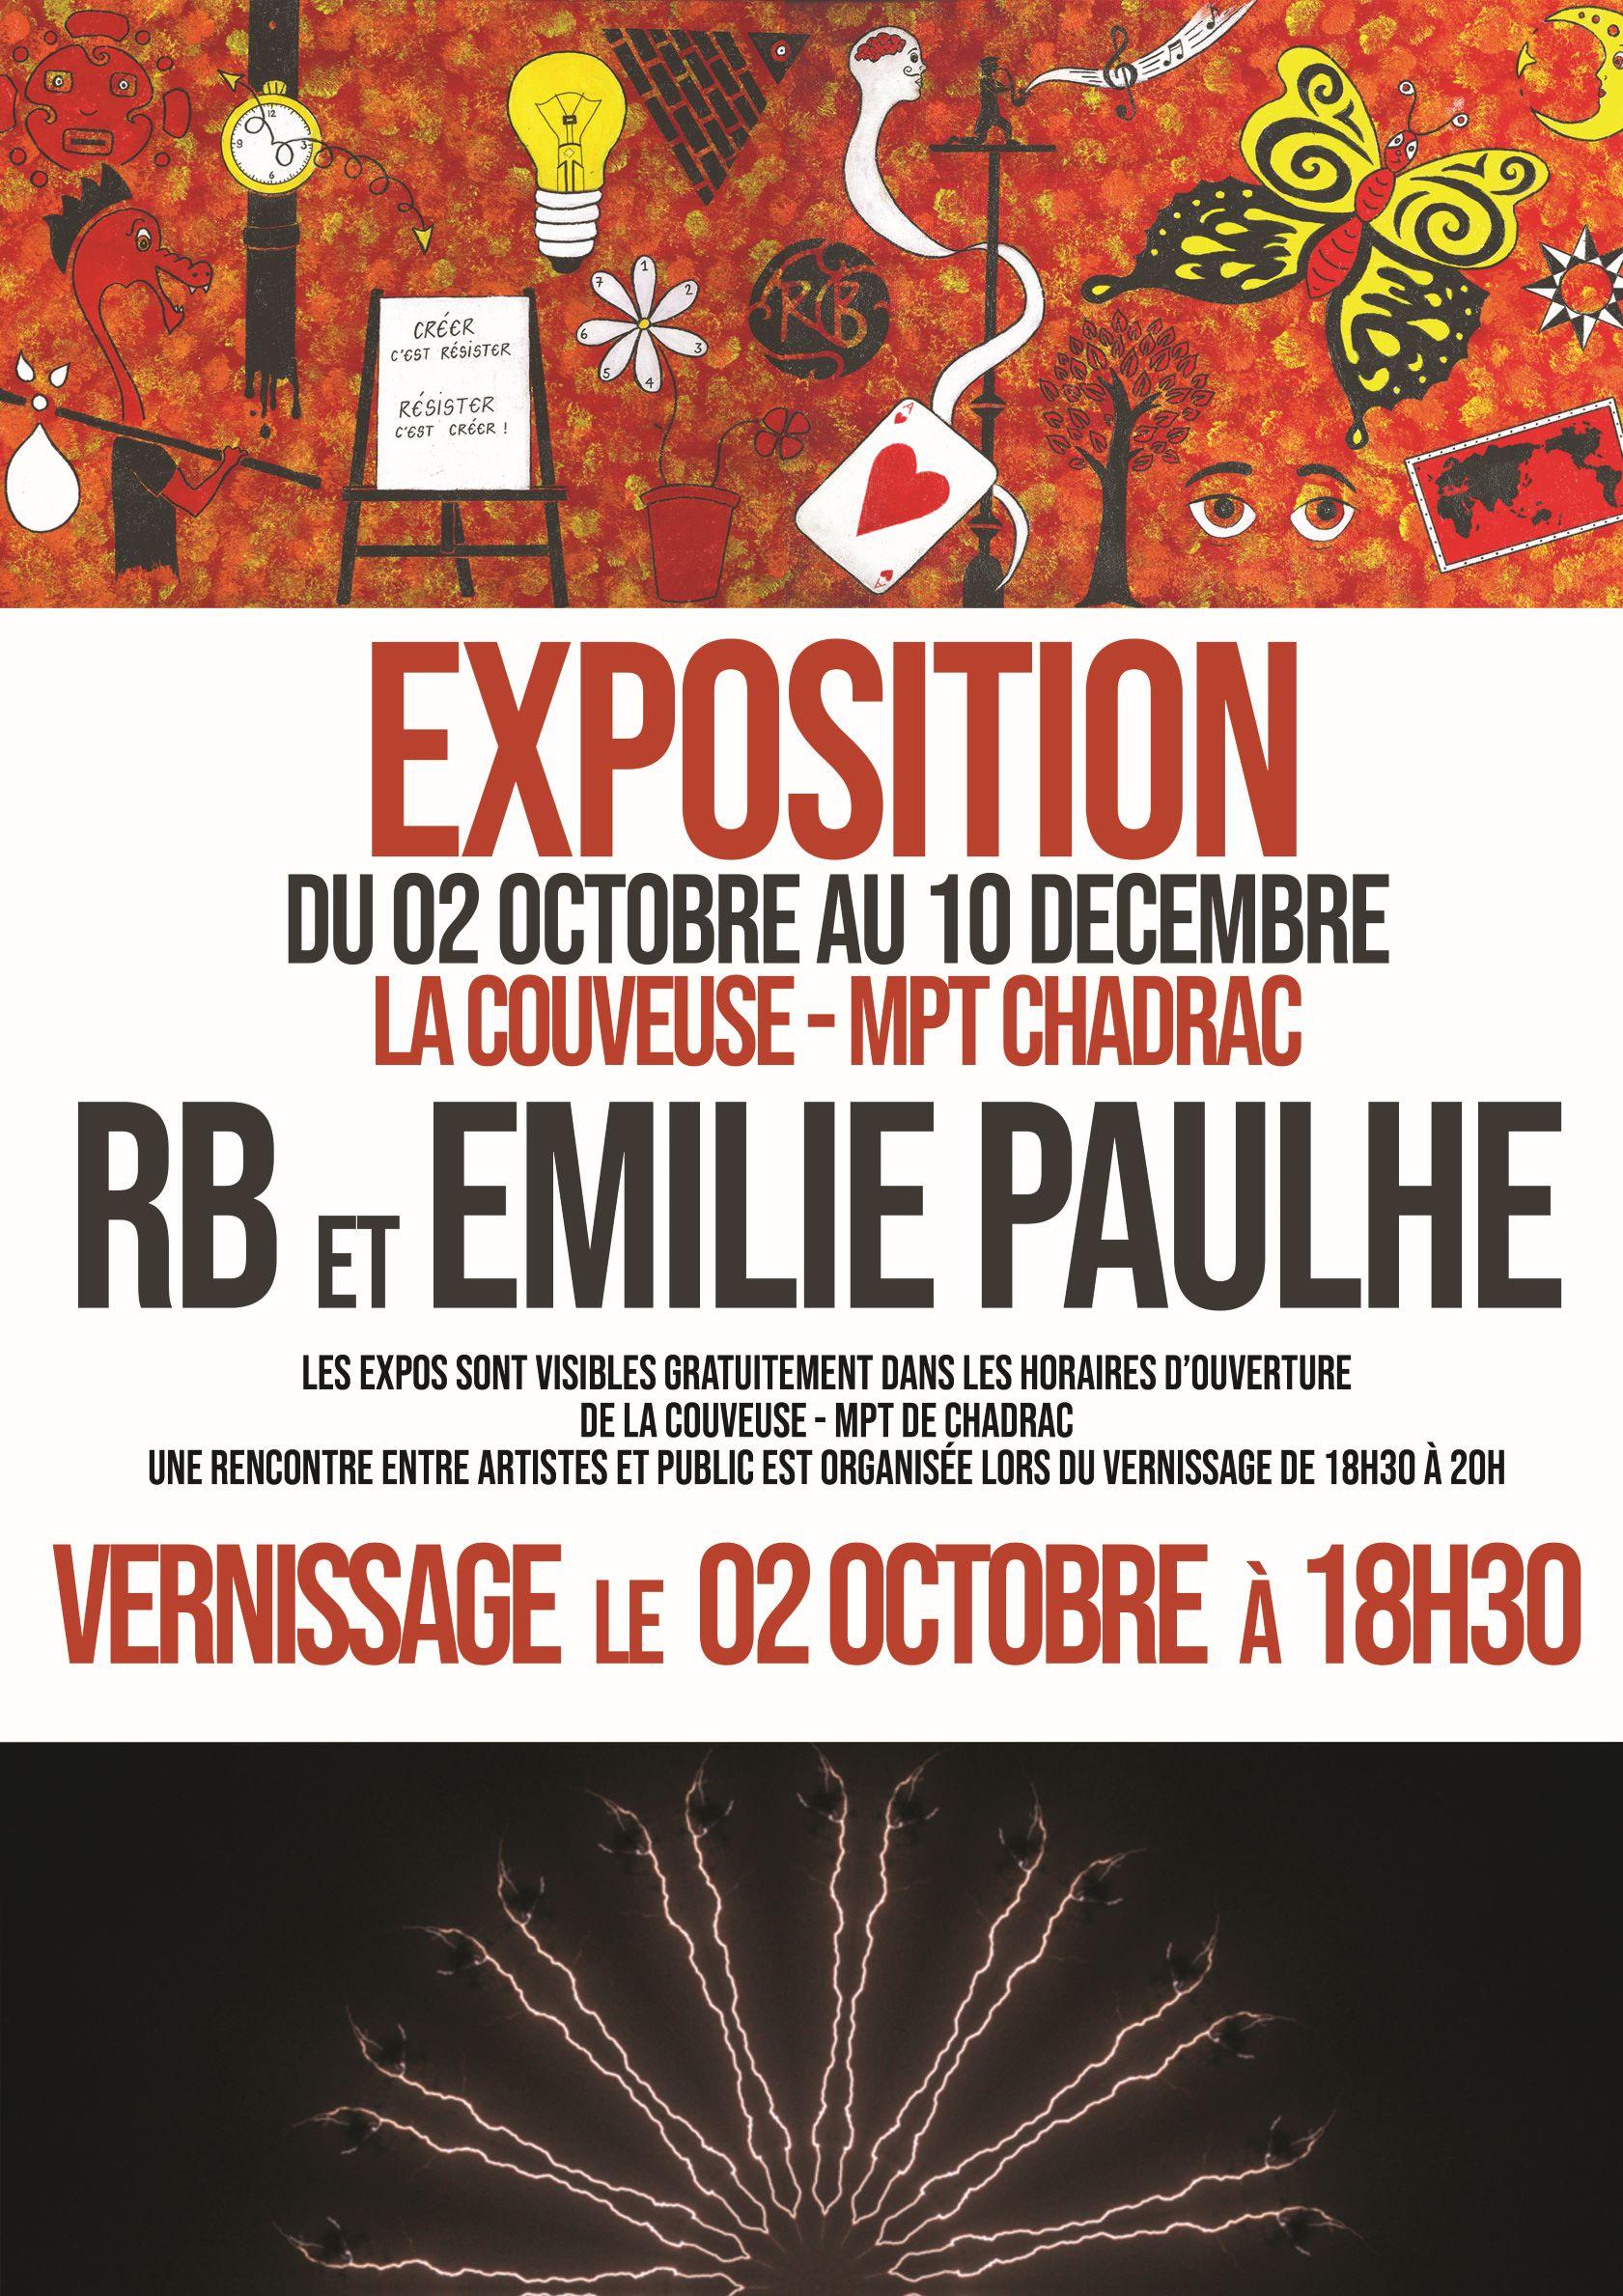 EXPO DU MOMENT